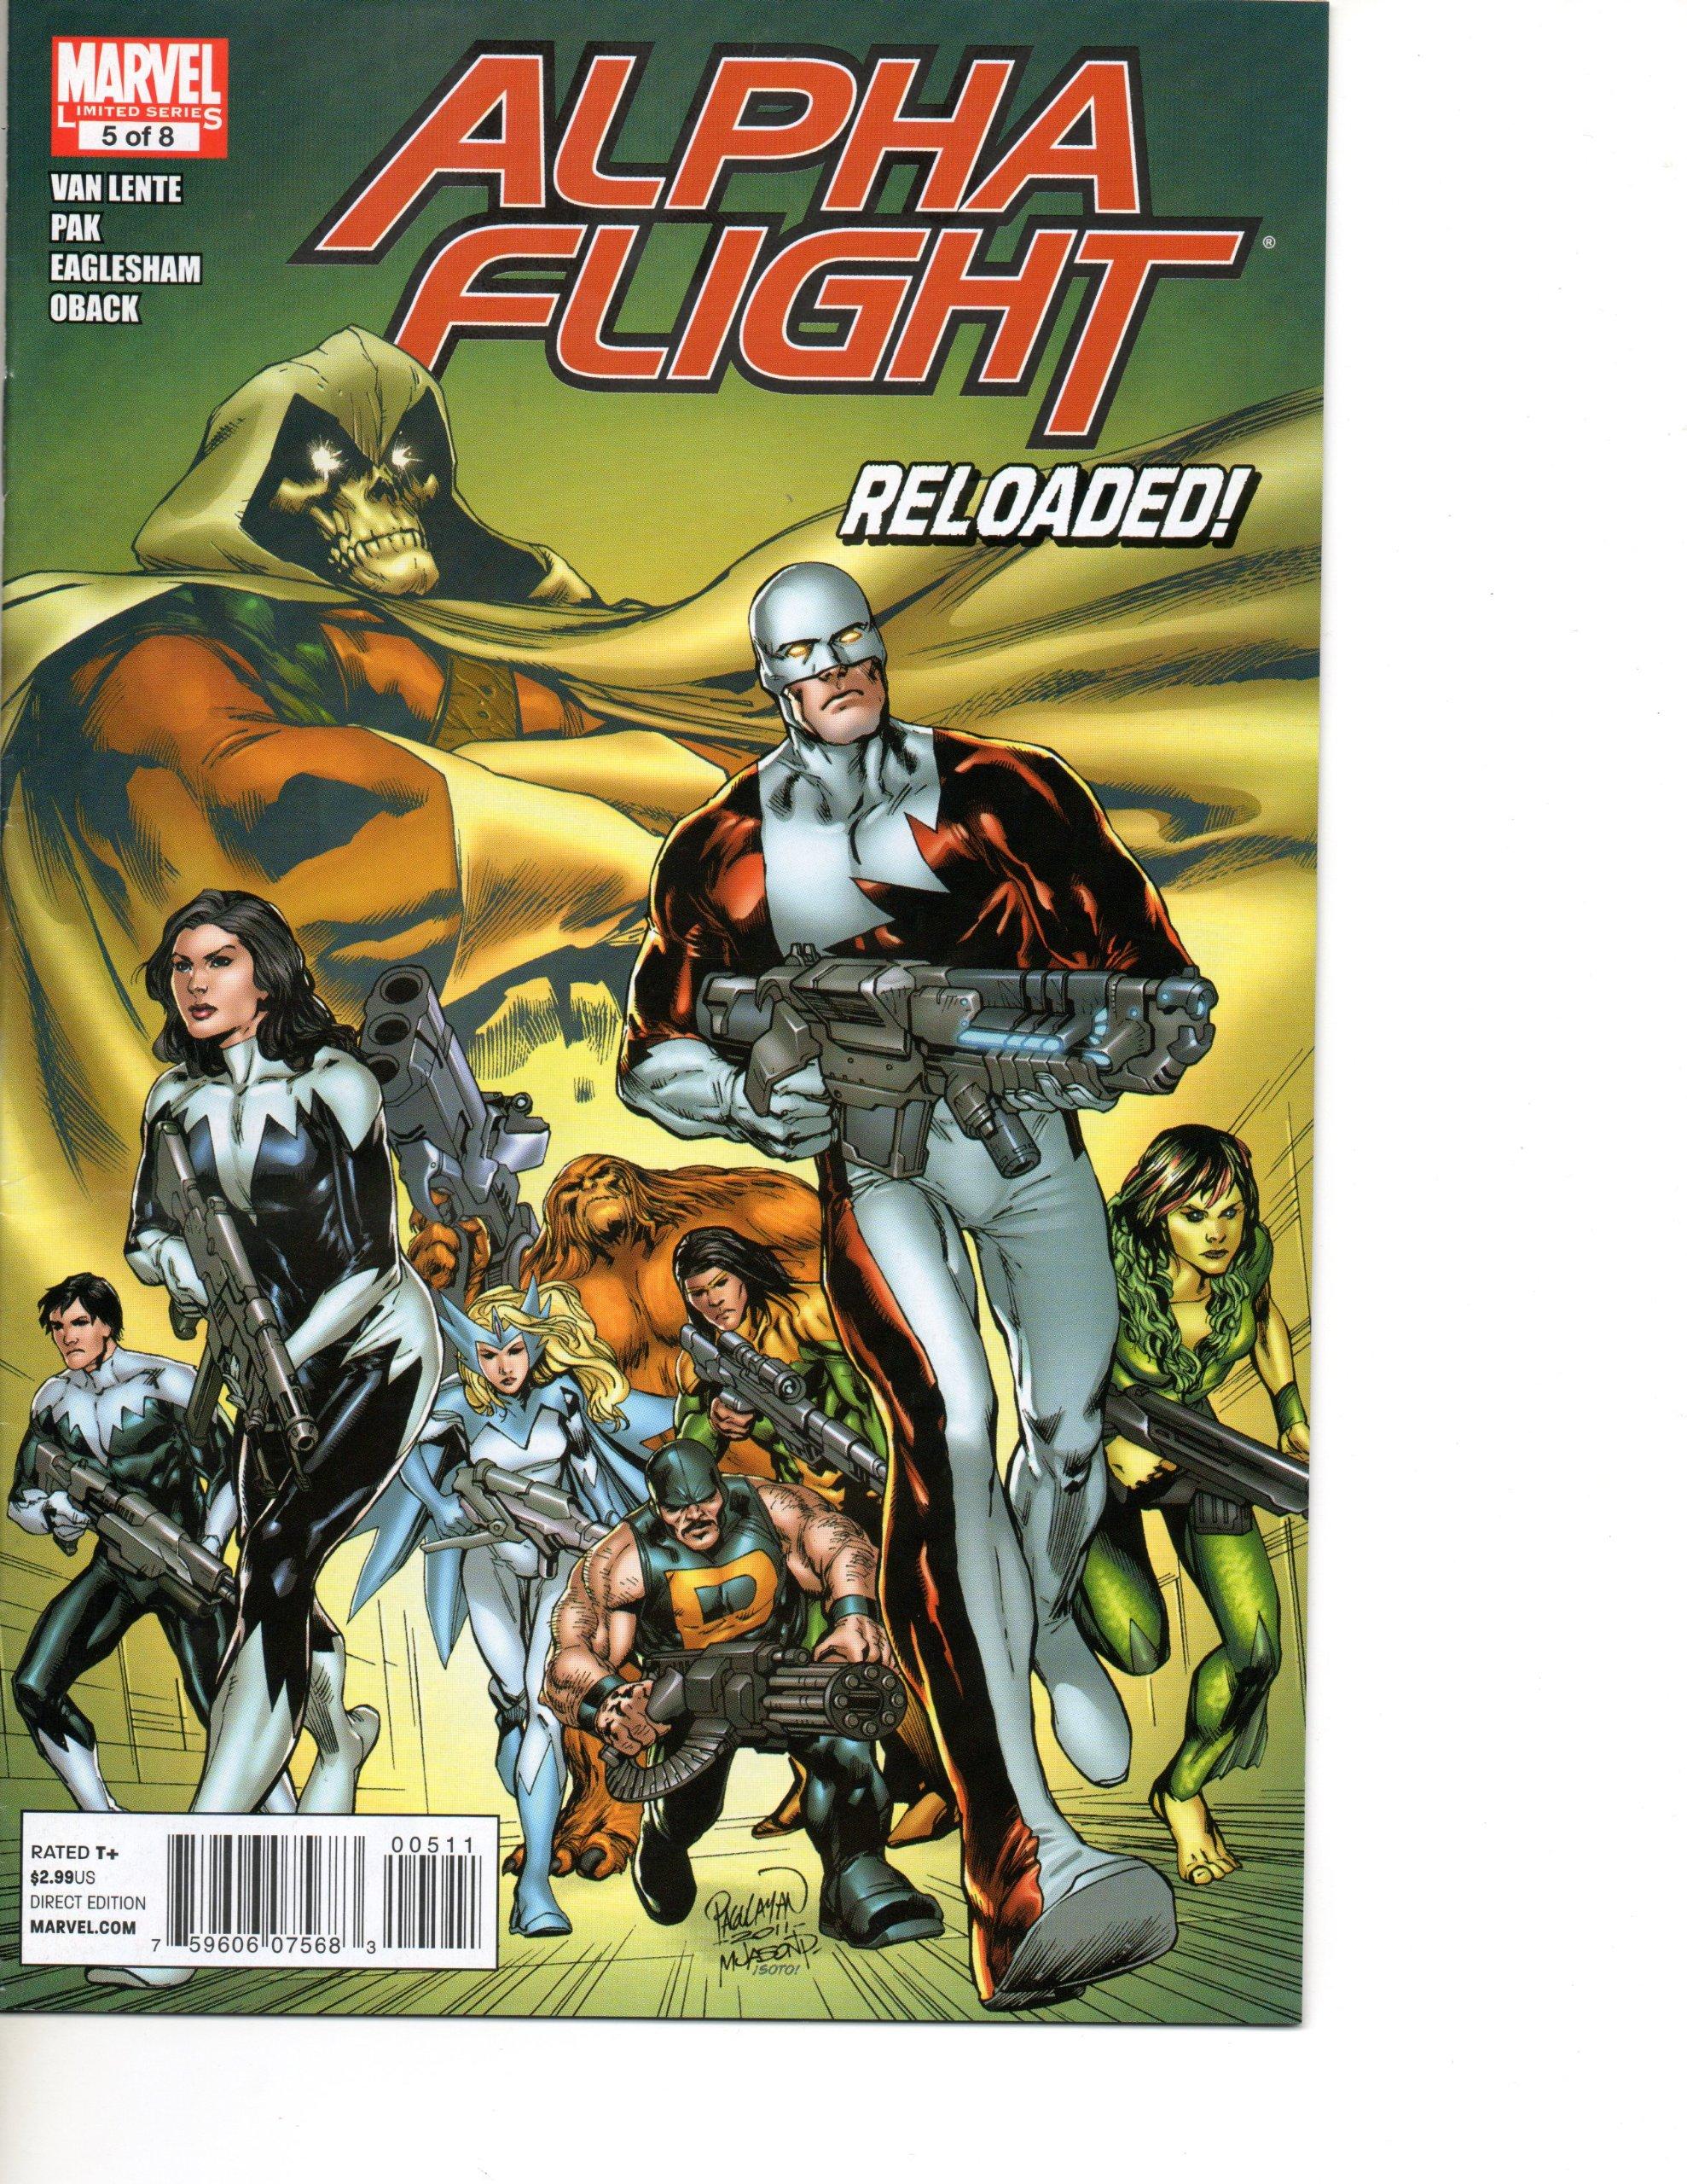 Read Online Alpha Flight #5 (Reloaded: The Last Refuge, Vol. 1) ebook